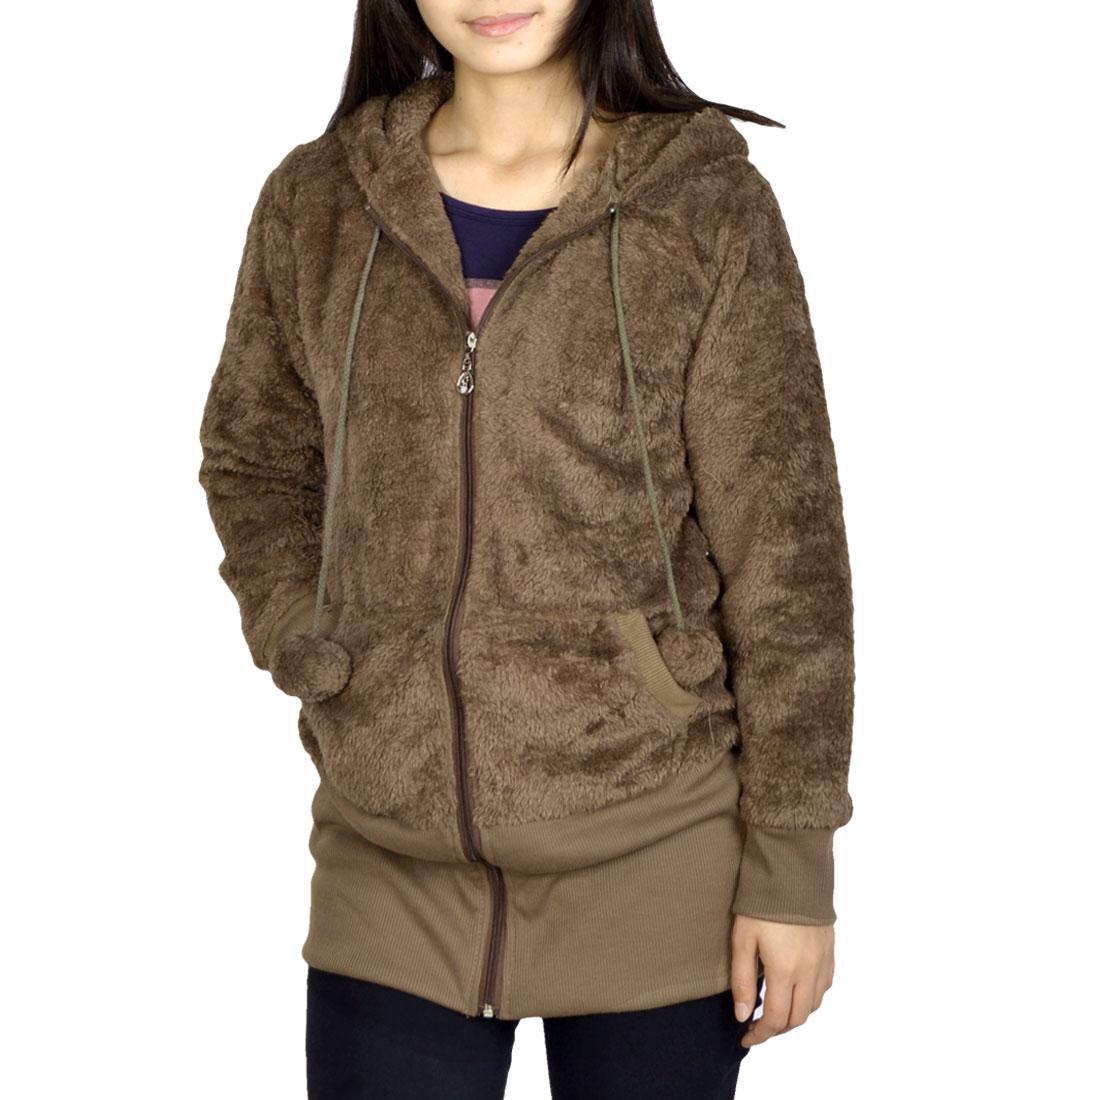 Ladies Two String Bobble Hood Decor Front Pockets Brown Plush Coat XS